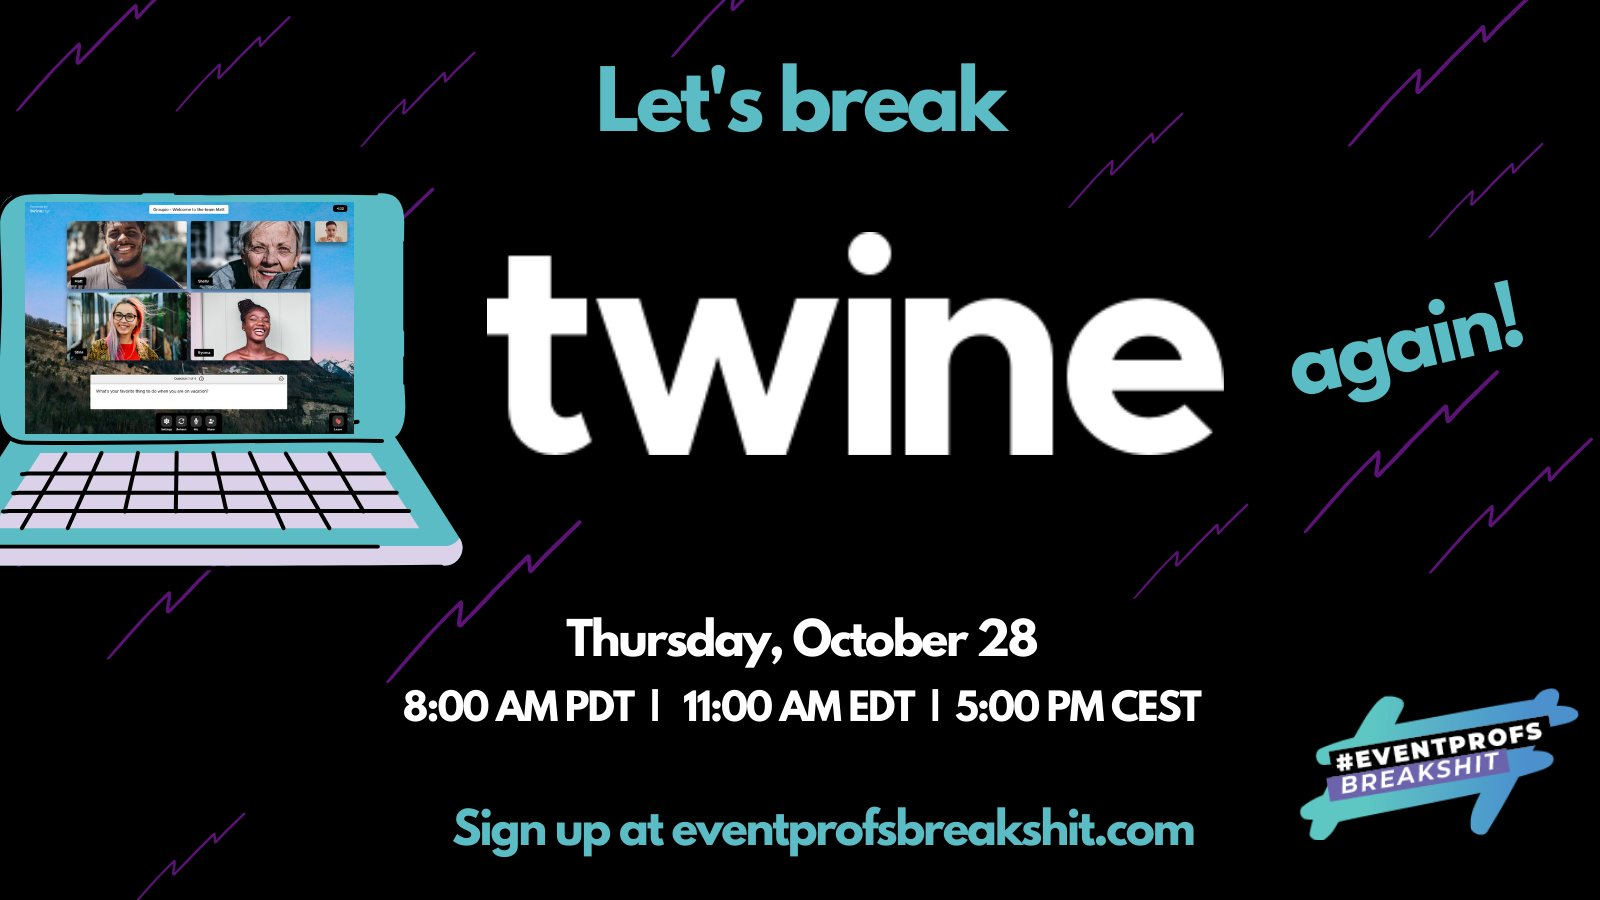 #EventprofsBreakShit x twine